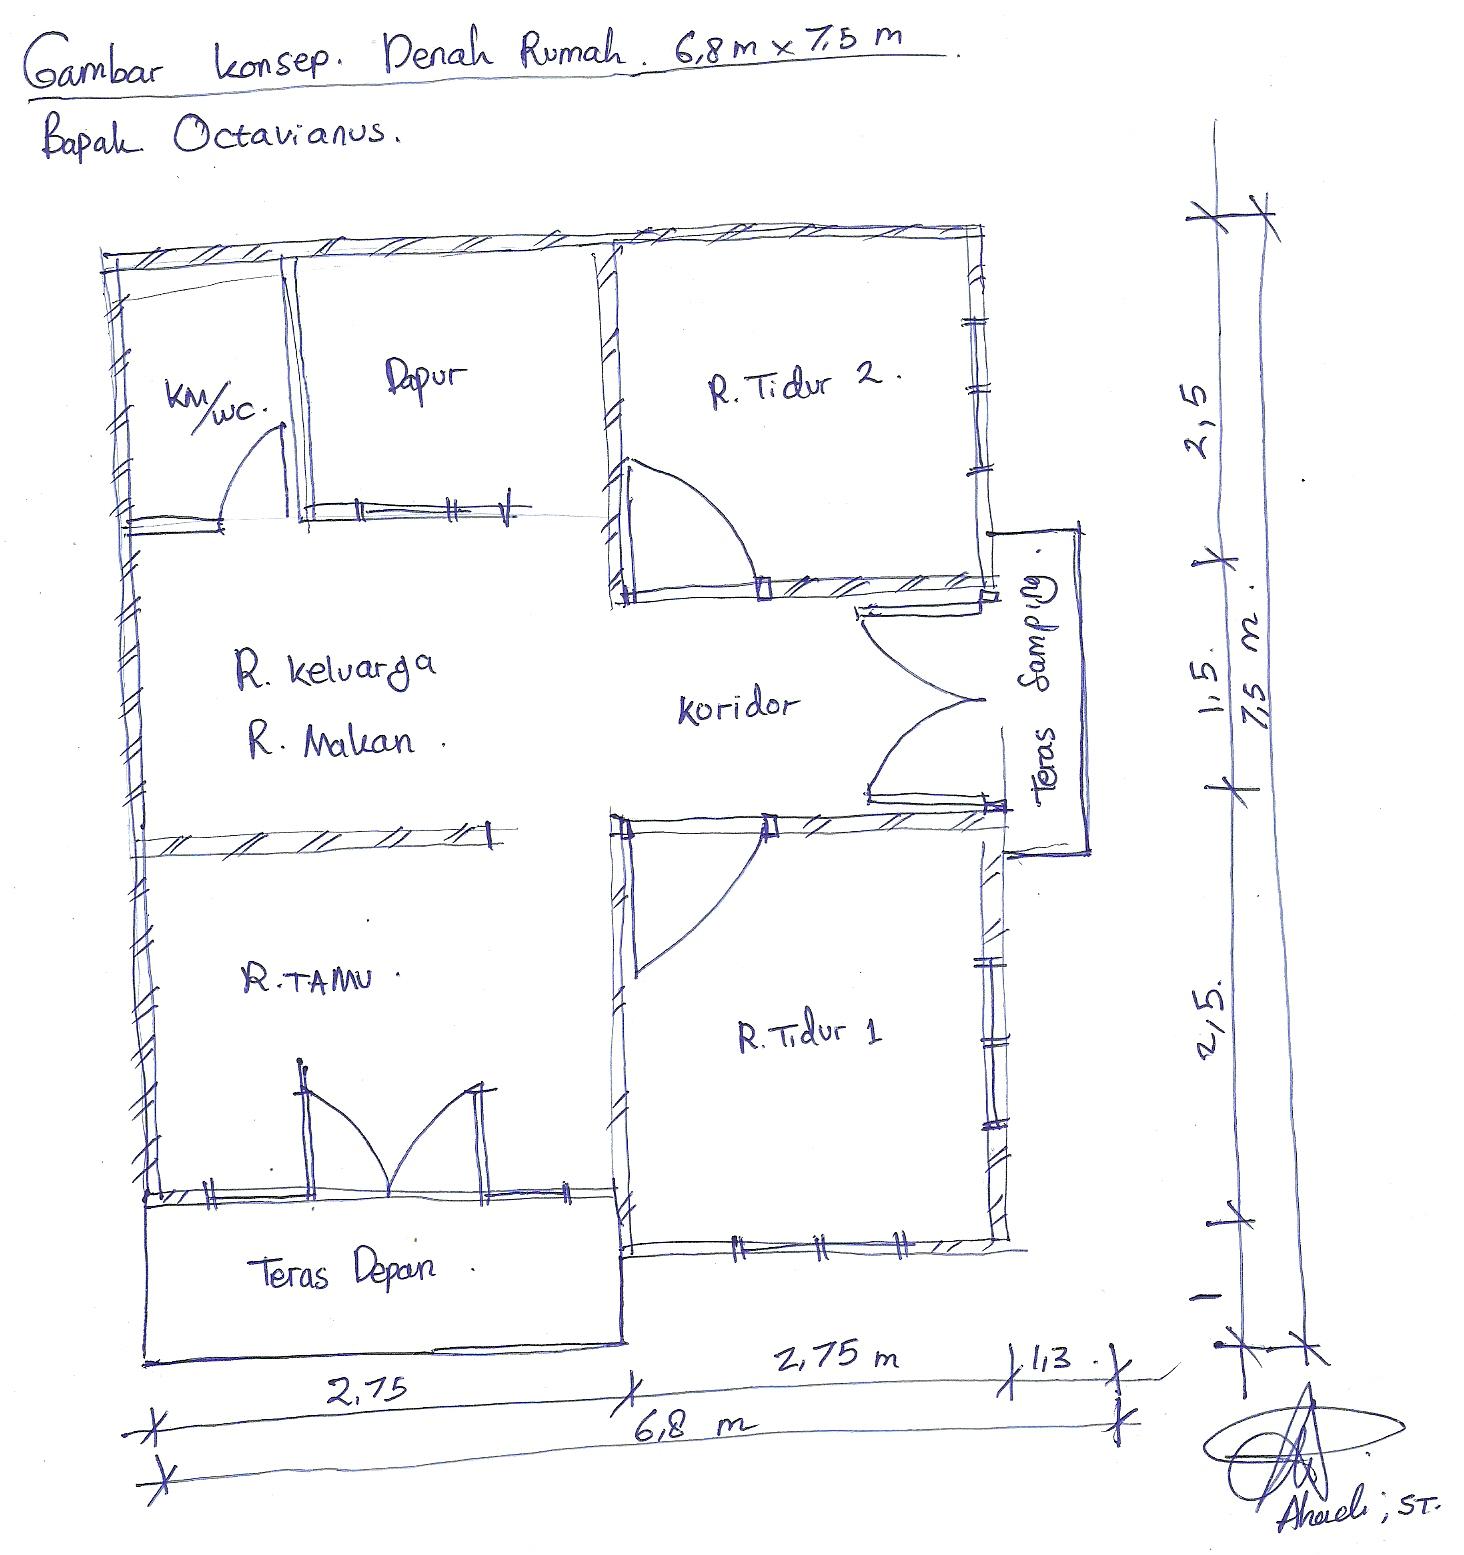 denah rumah ukuran 6 x 7